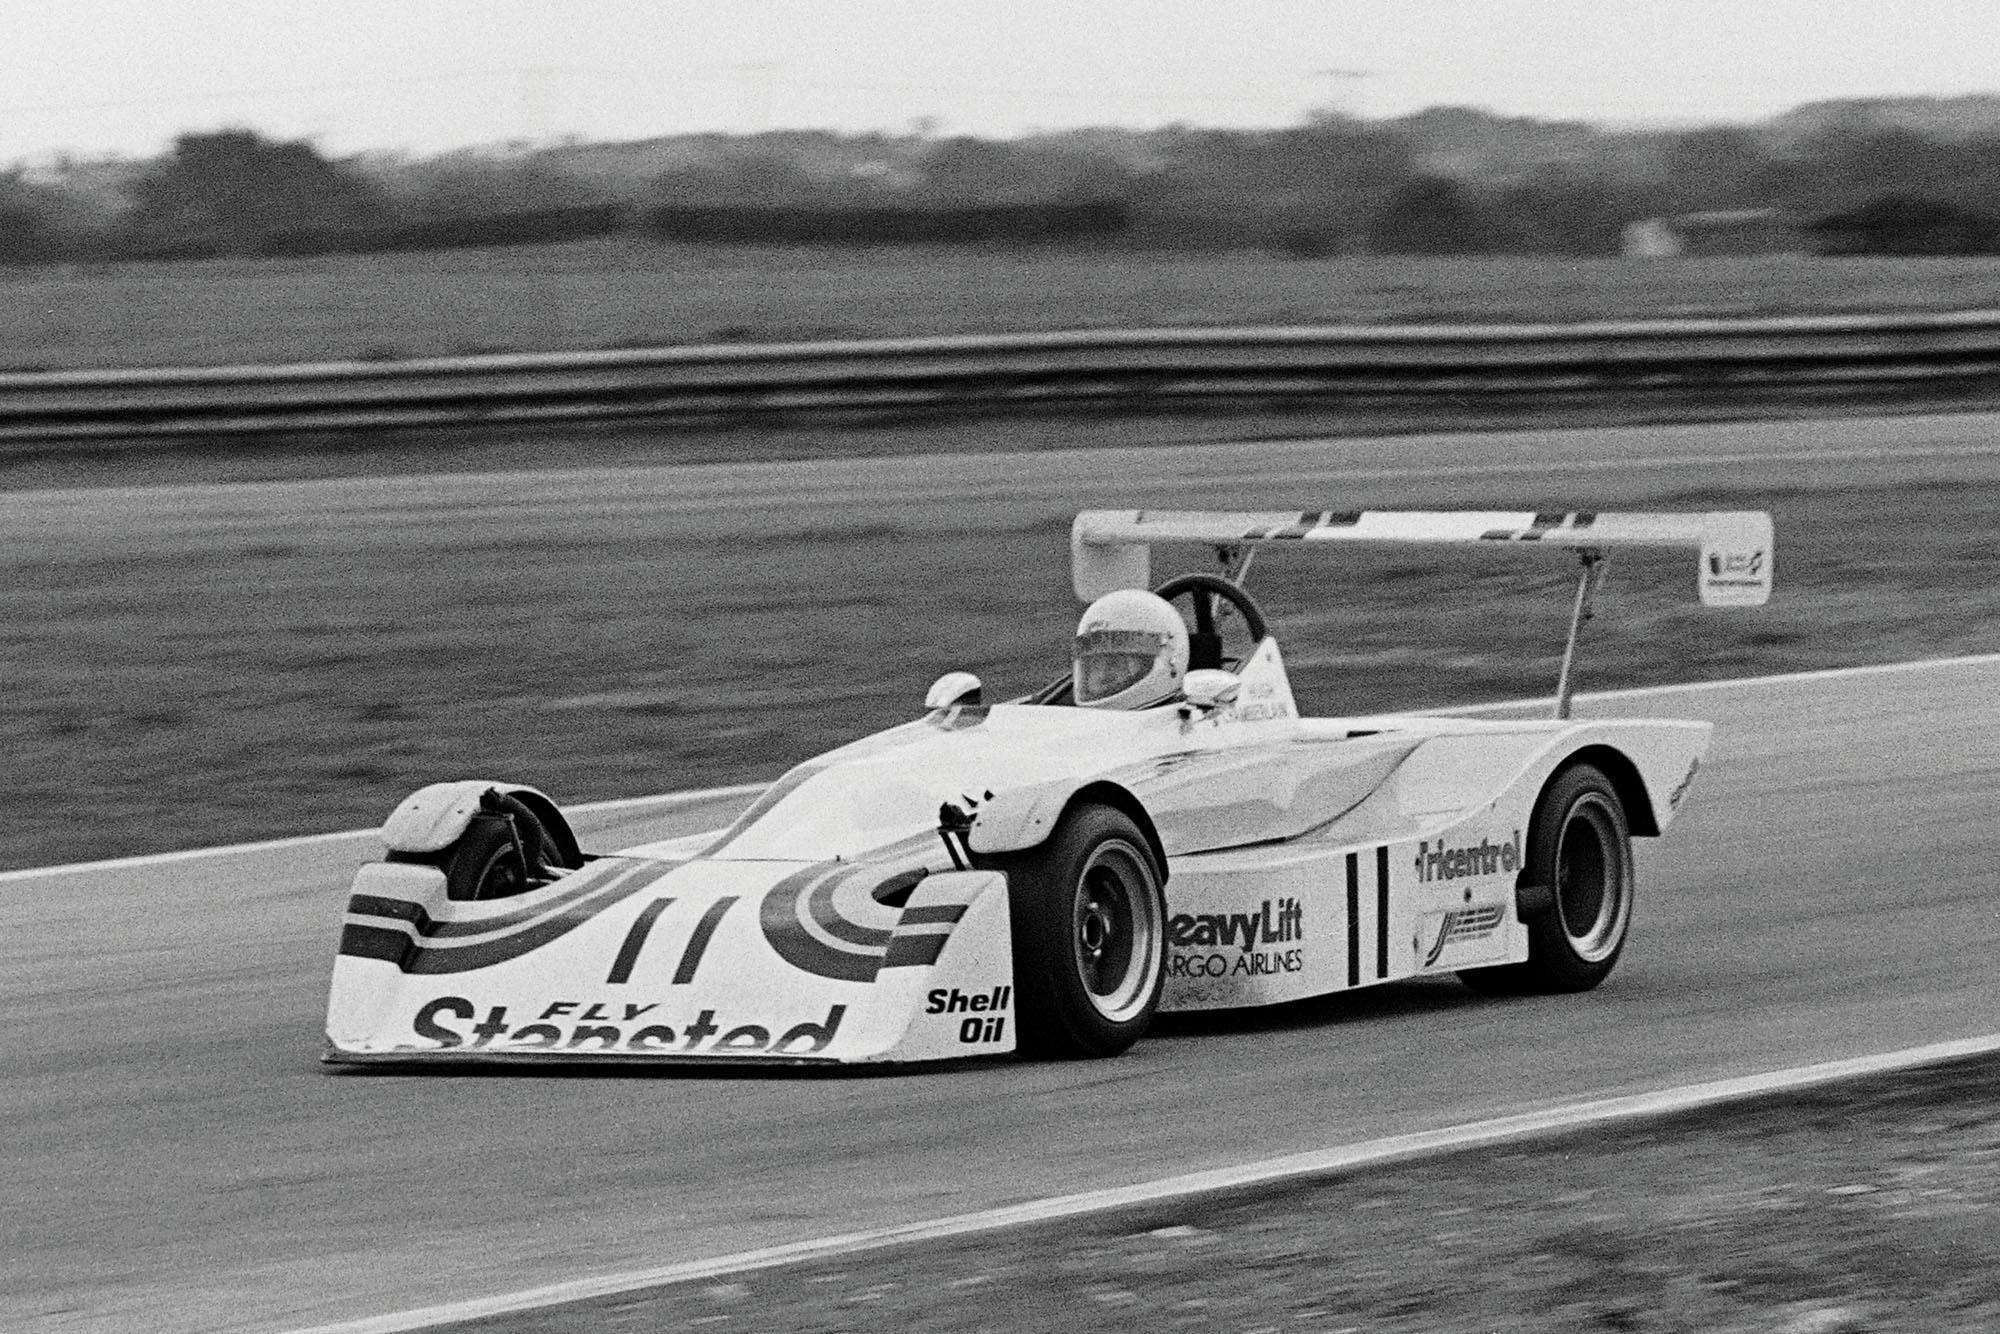 Hugh Chamberlain driving